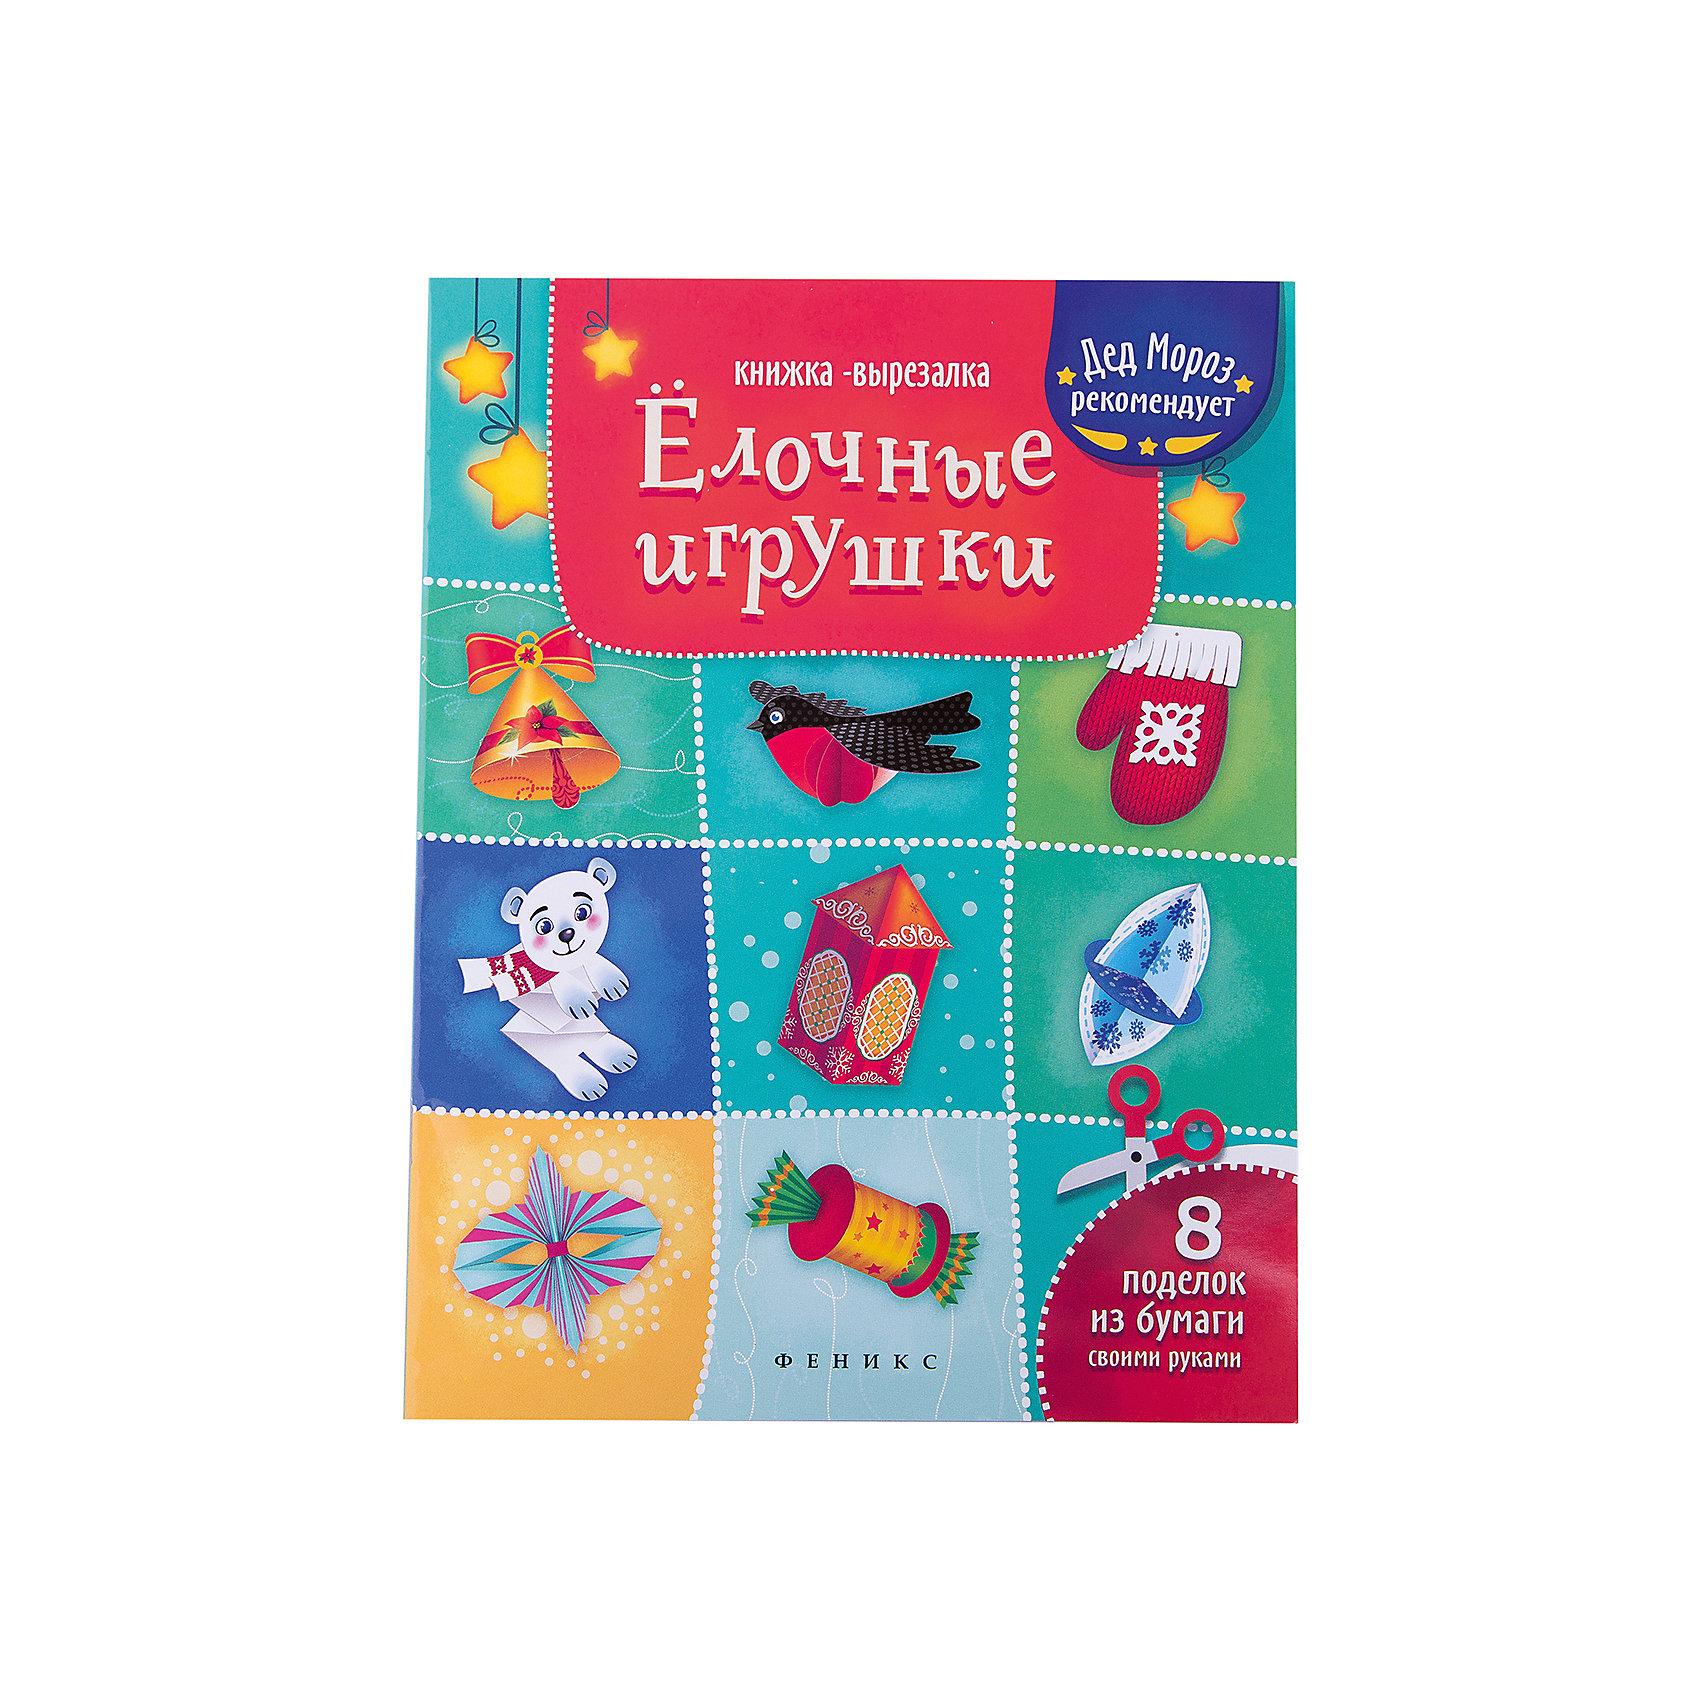 Fenix Елочные игрушки: книжка-вырезалка шахова м даркова ю новогодние елки и игрушки